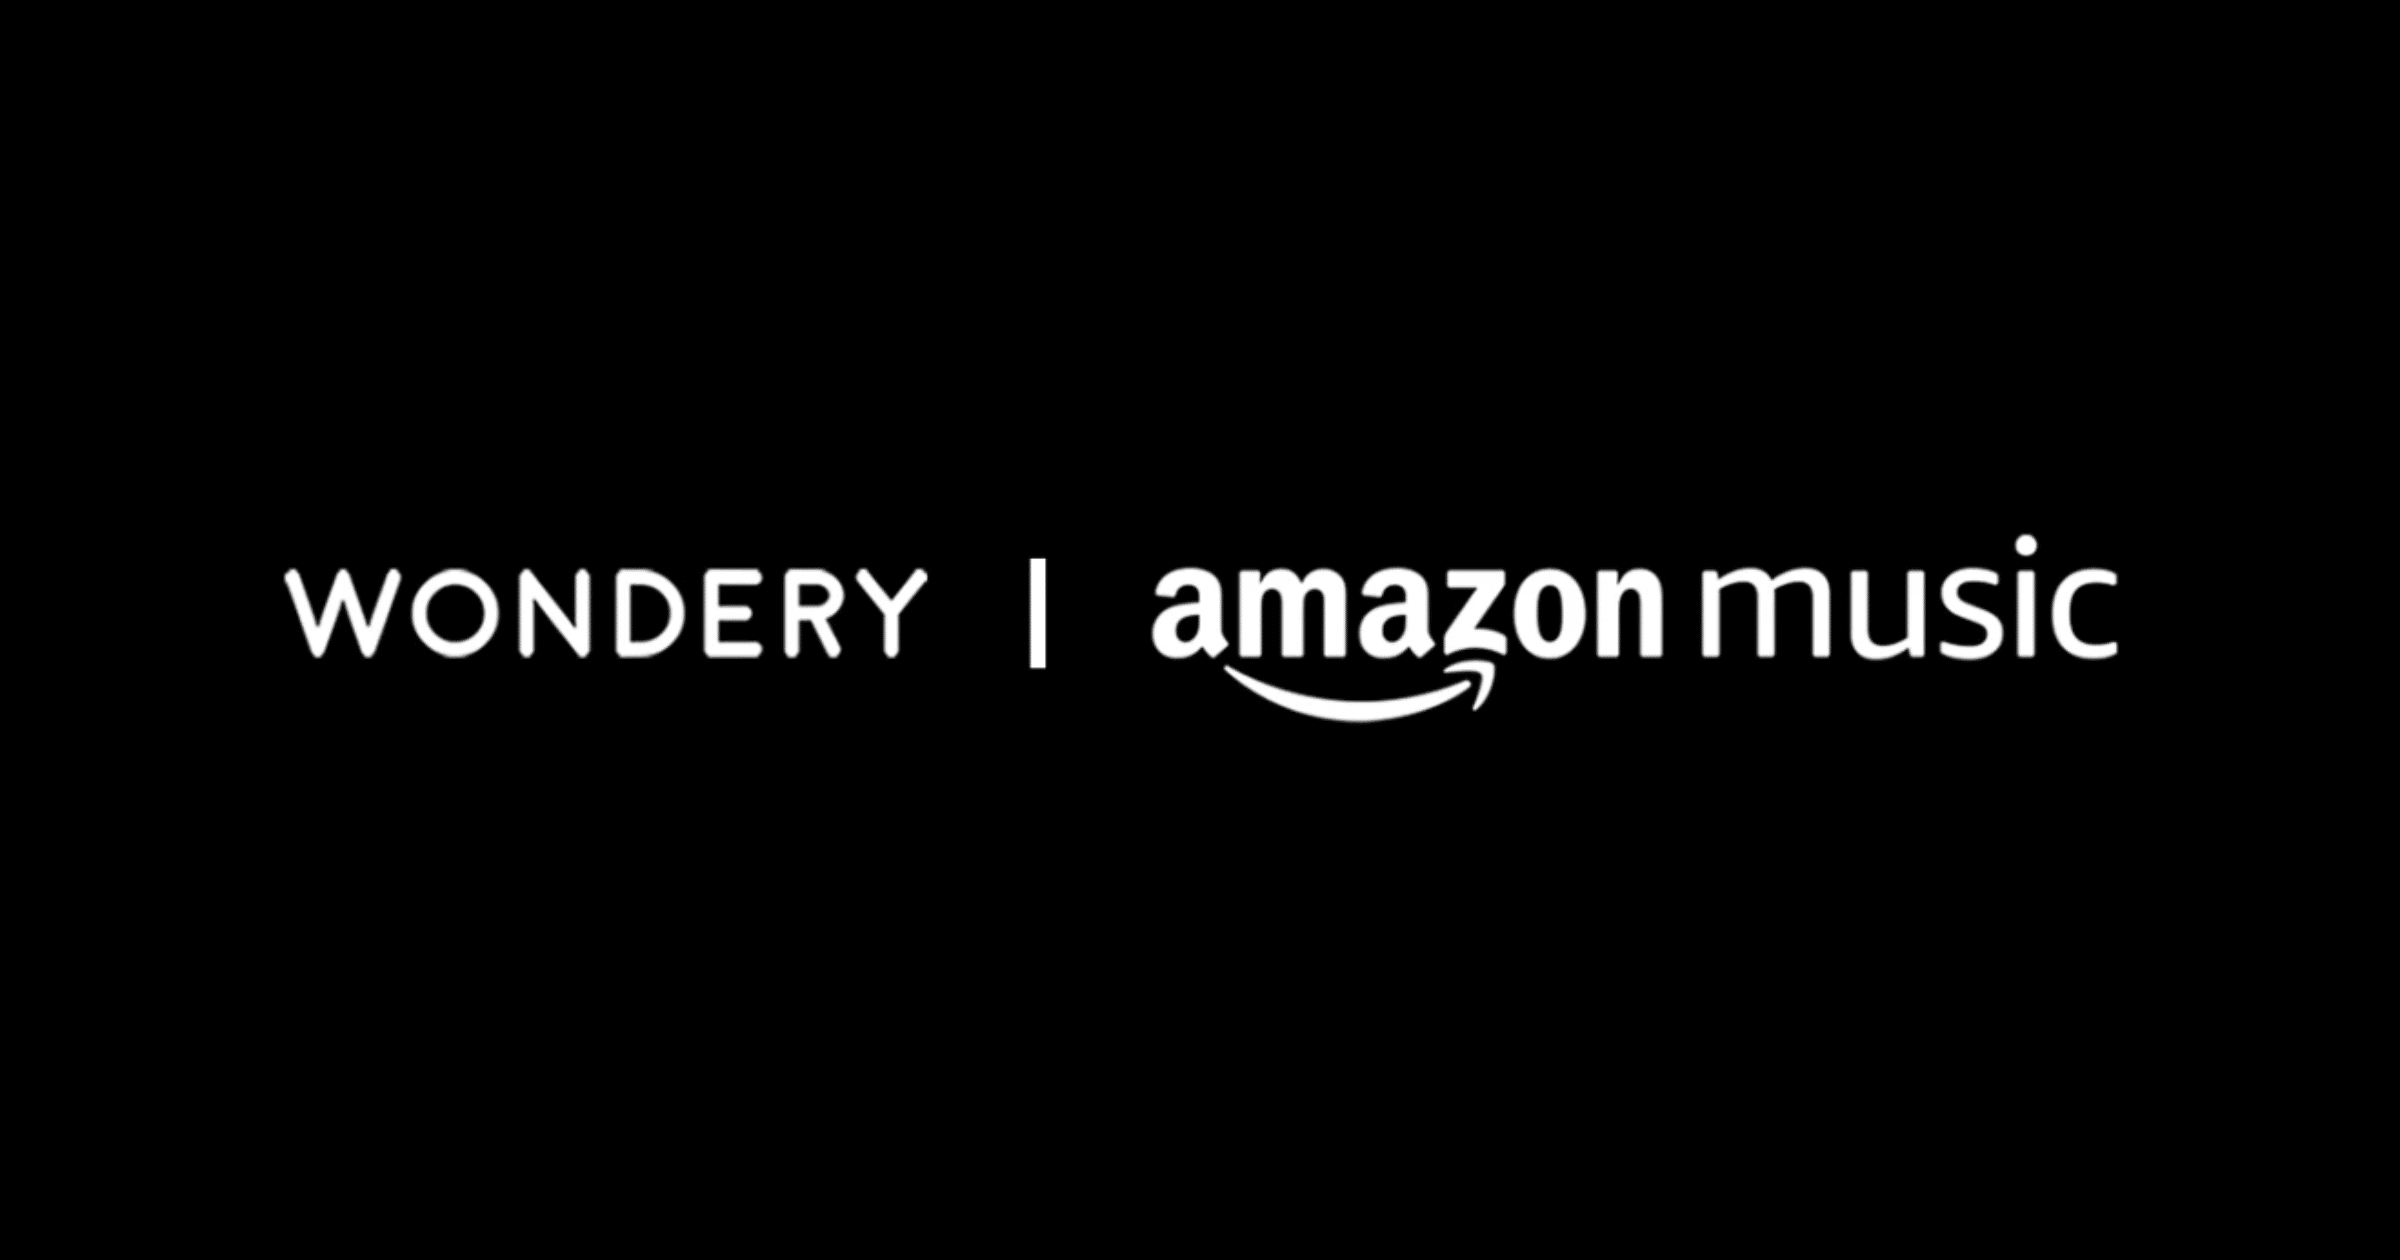 Amazon has purchased podcast network Wondery